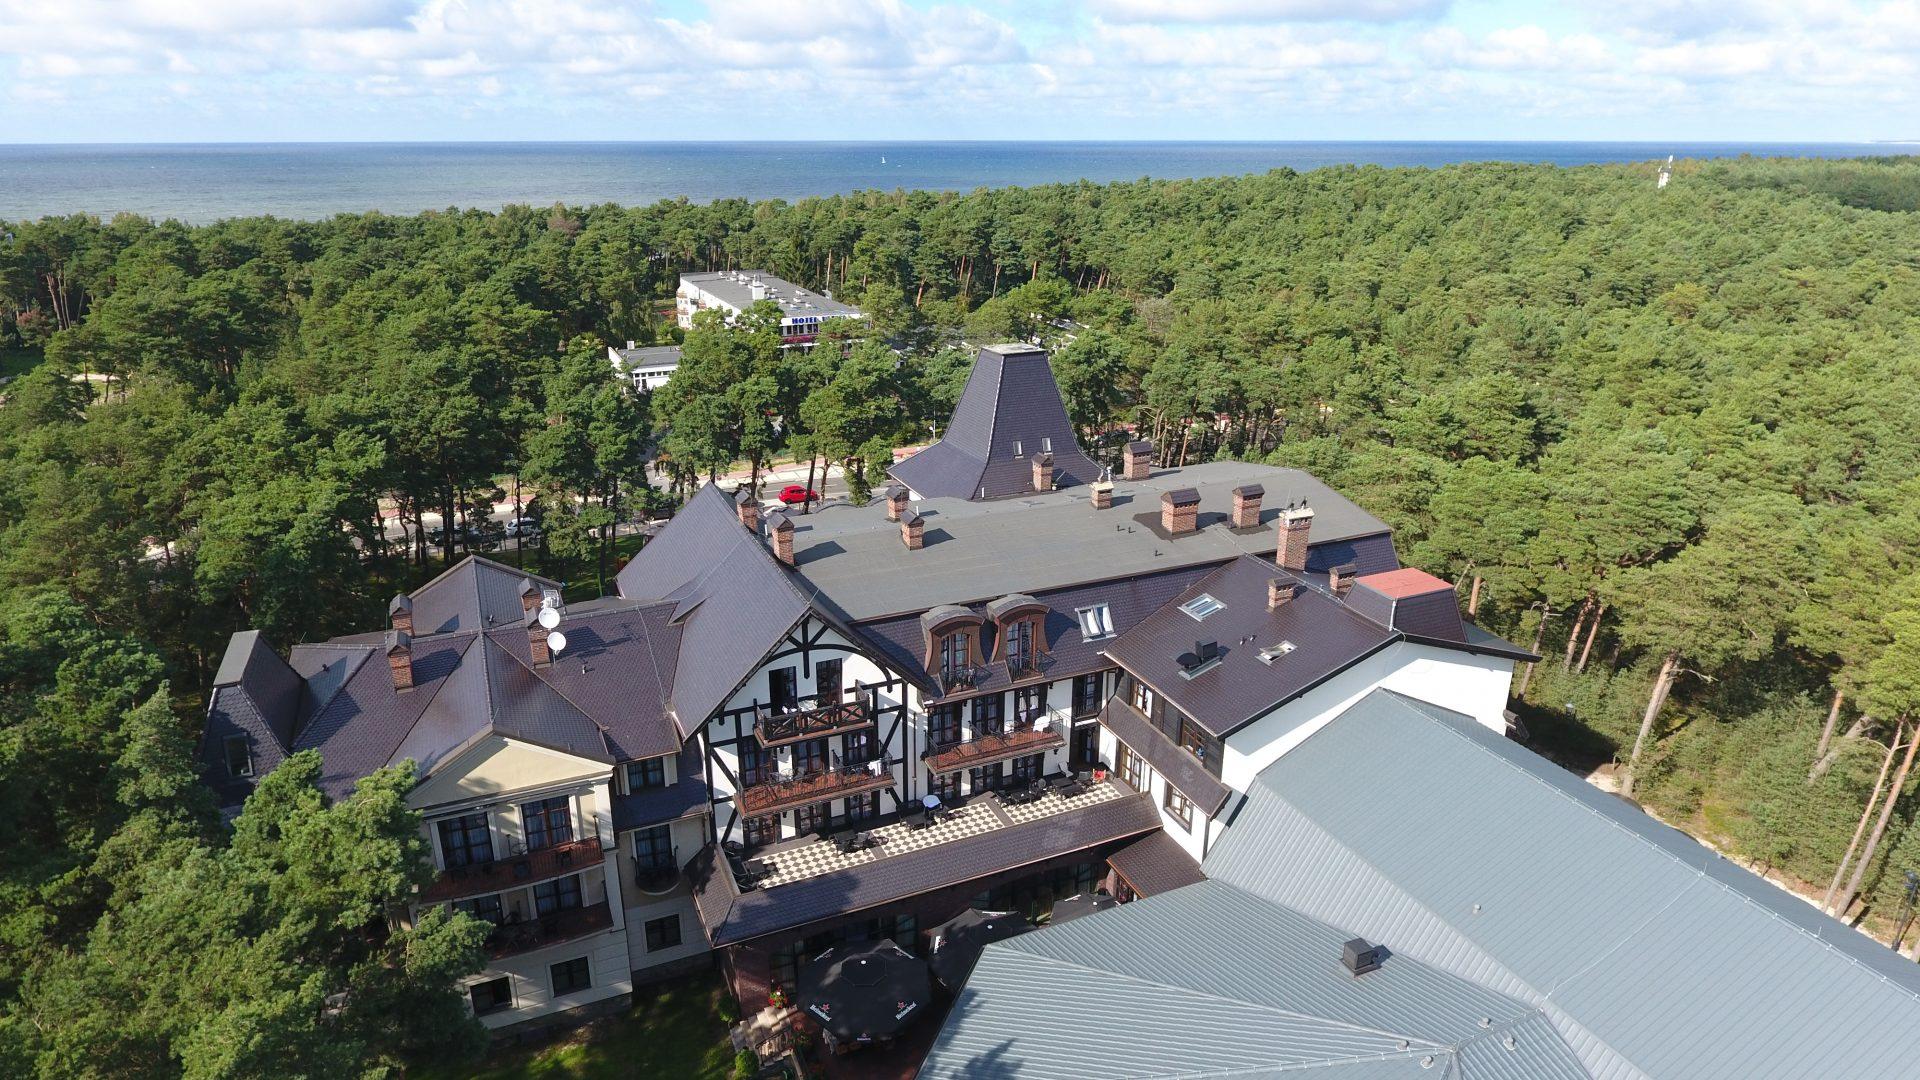 Zdjecia z drona na pensjonat nad morzem - hotel Royal Baltic